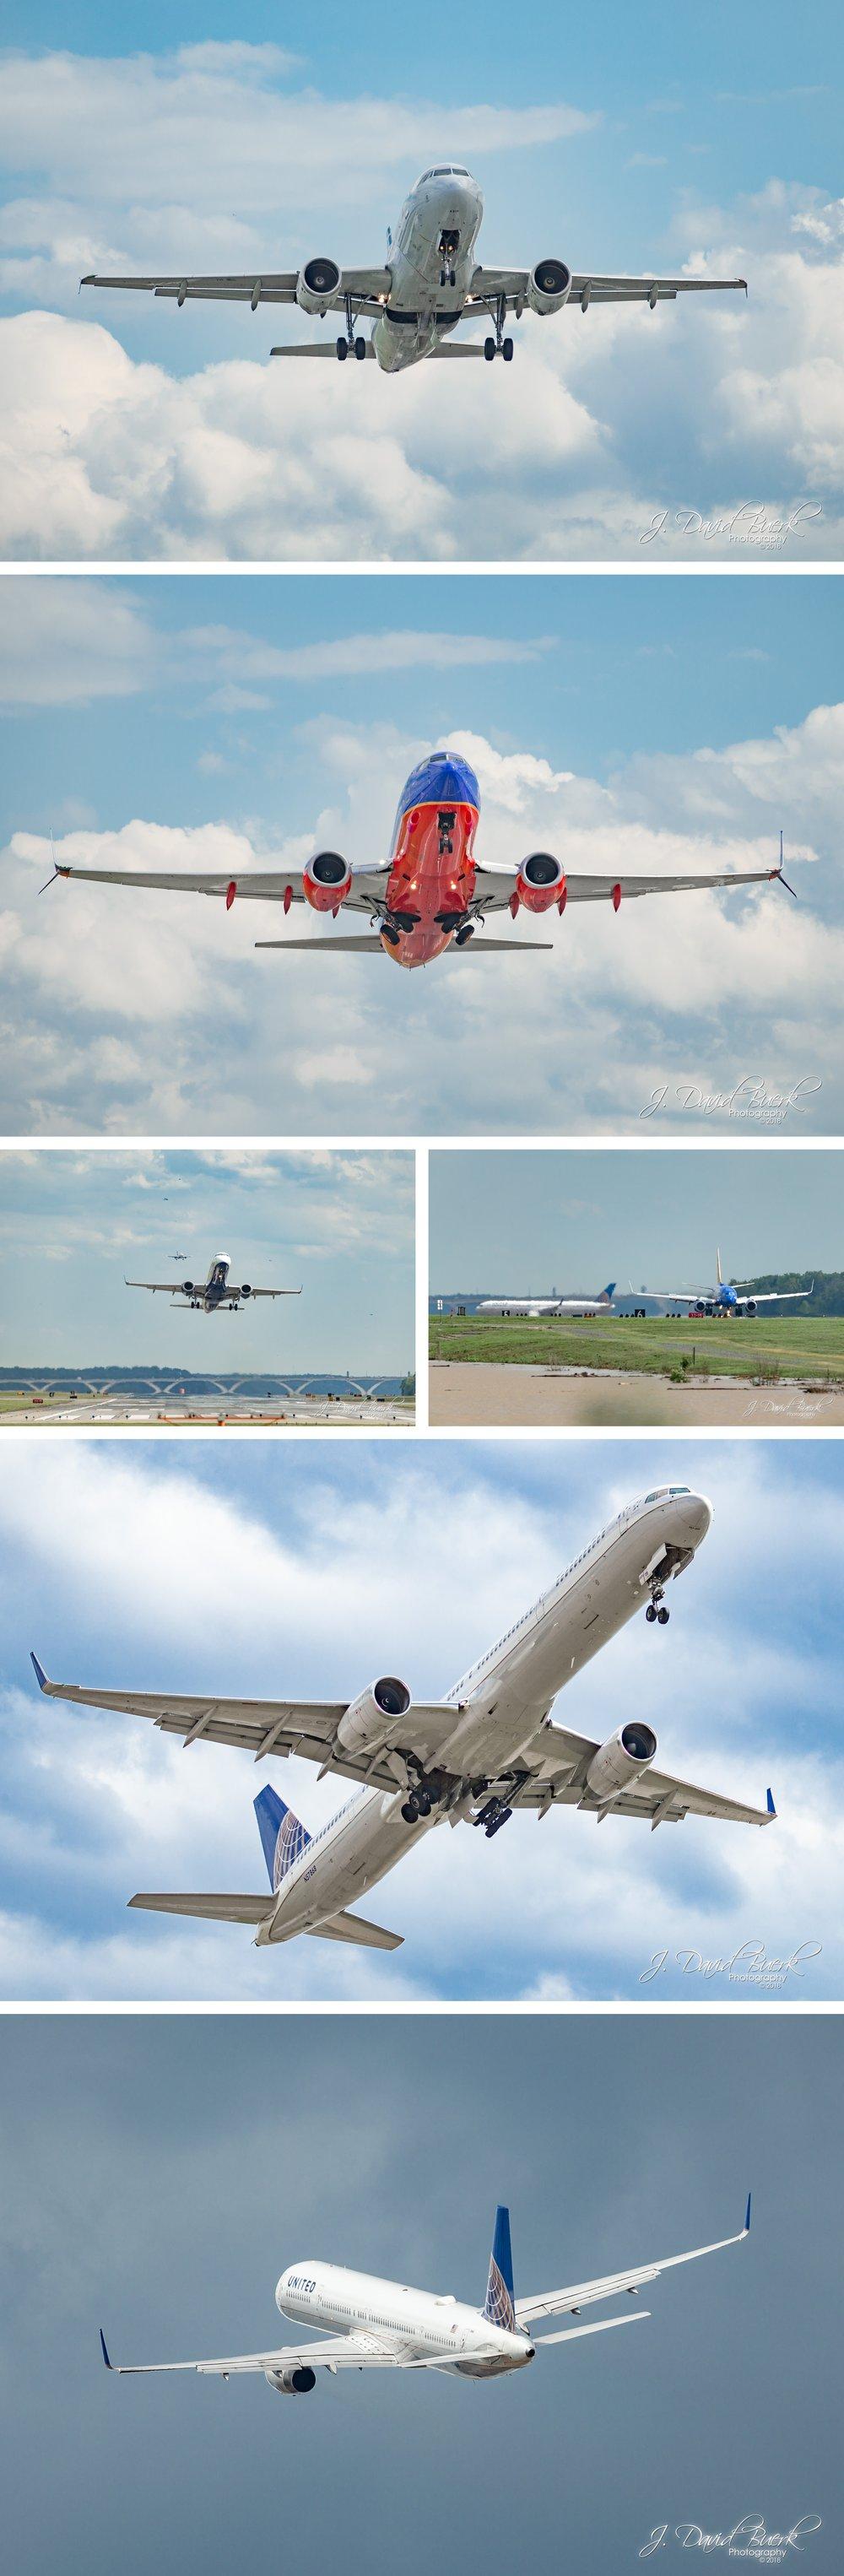 20180605 DCA Planespotting 4.jpg